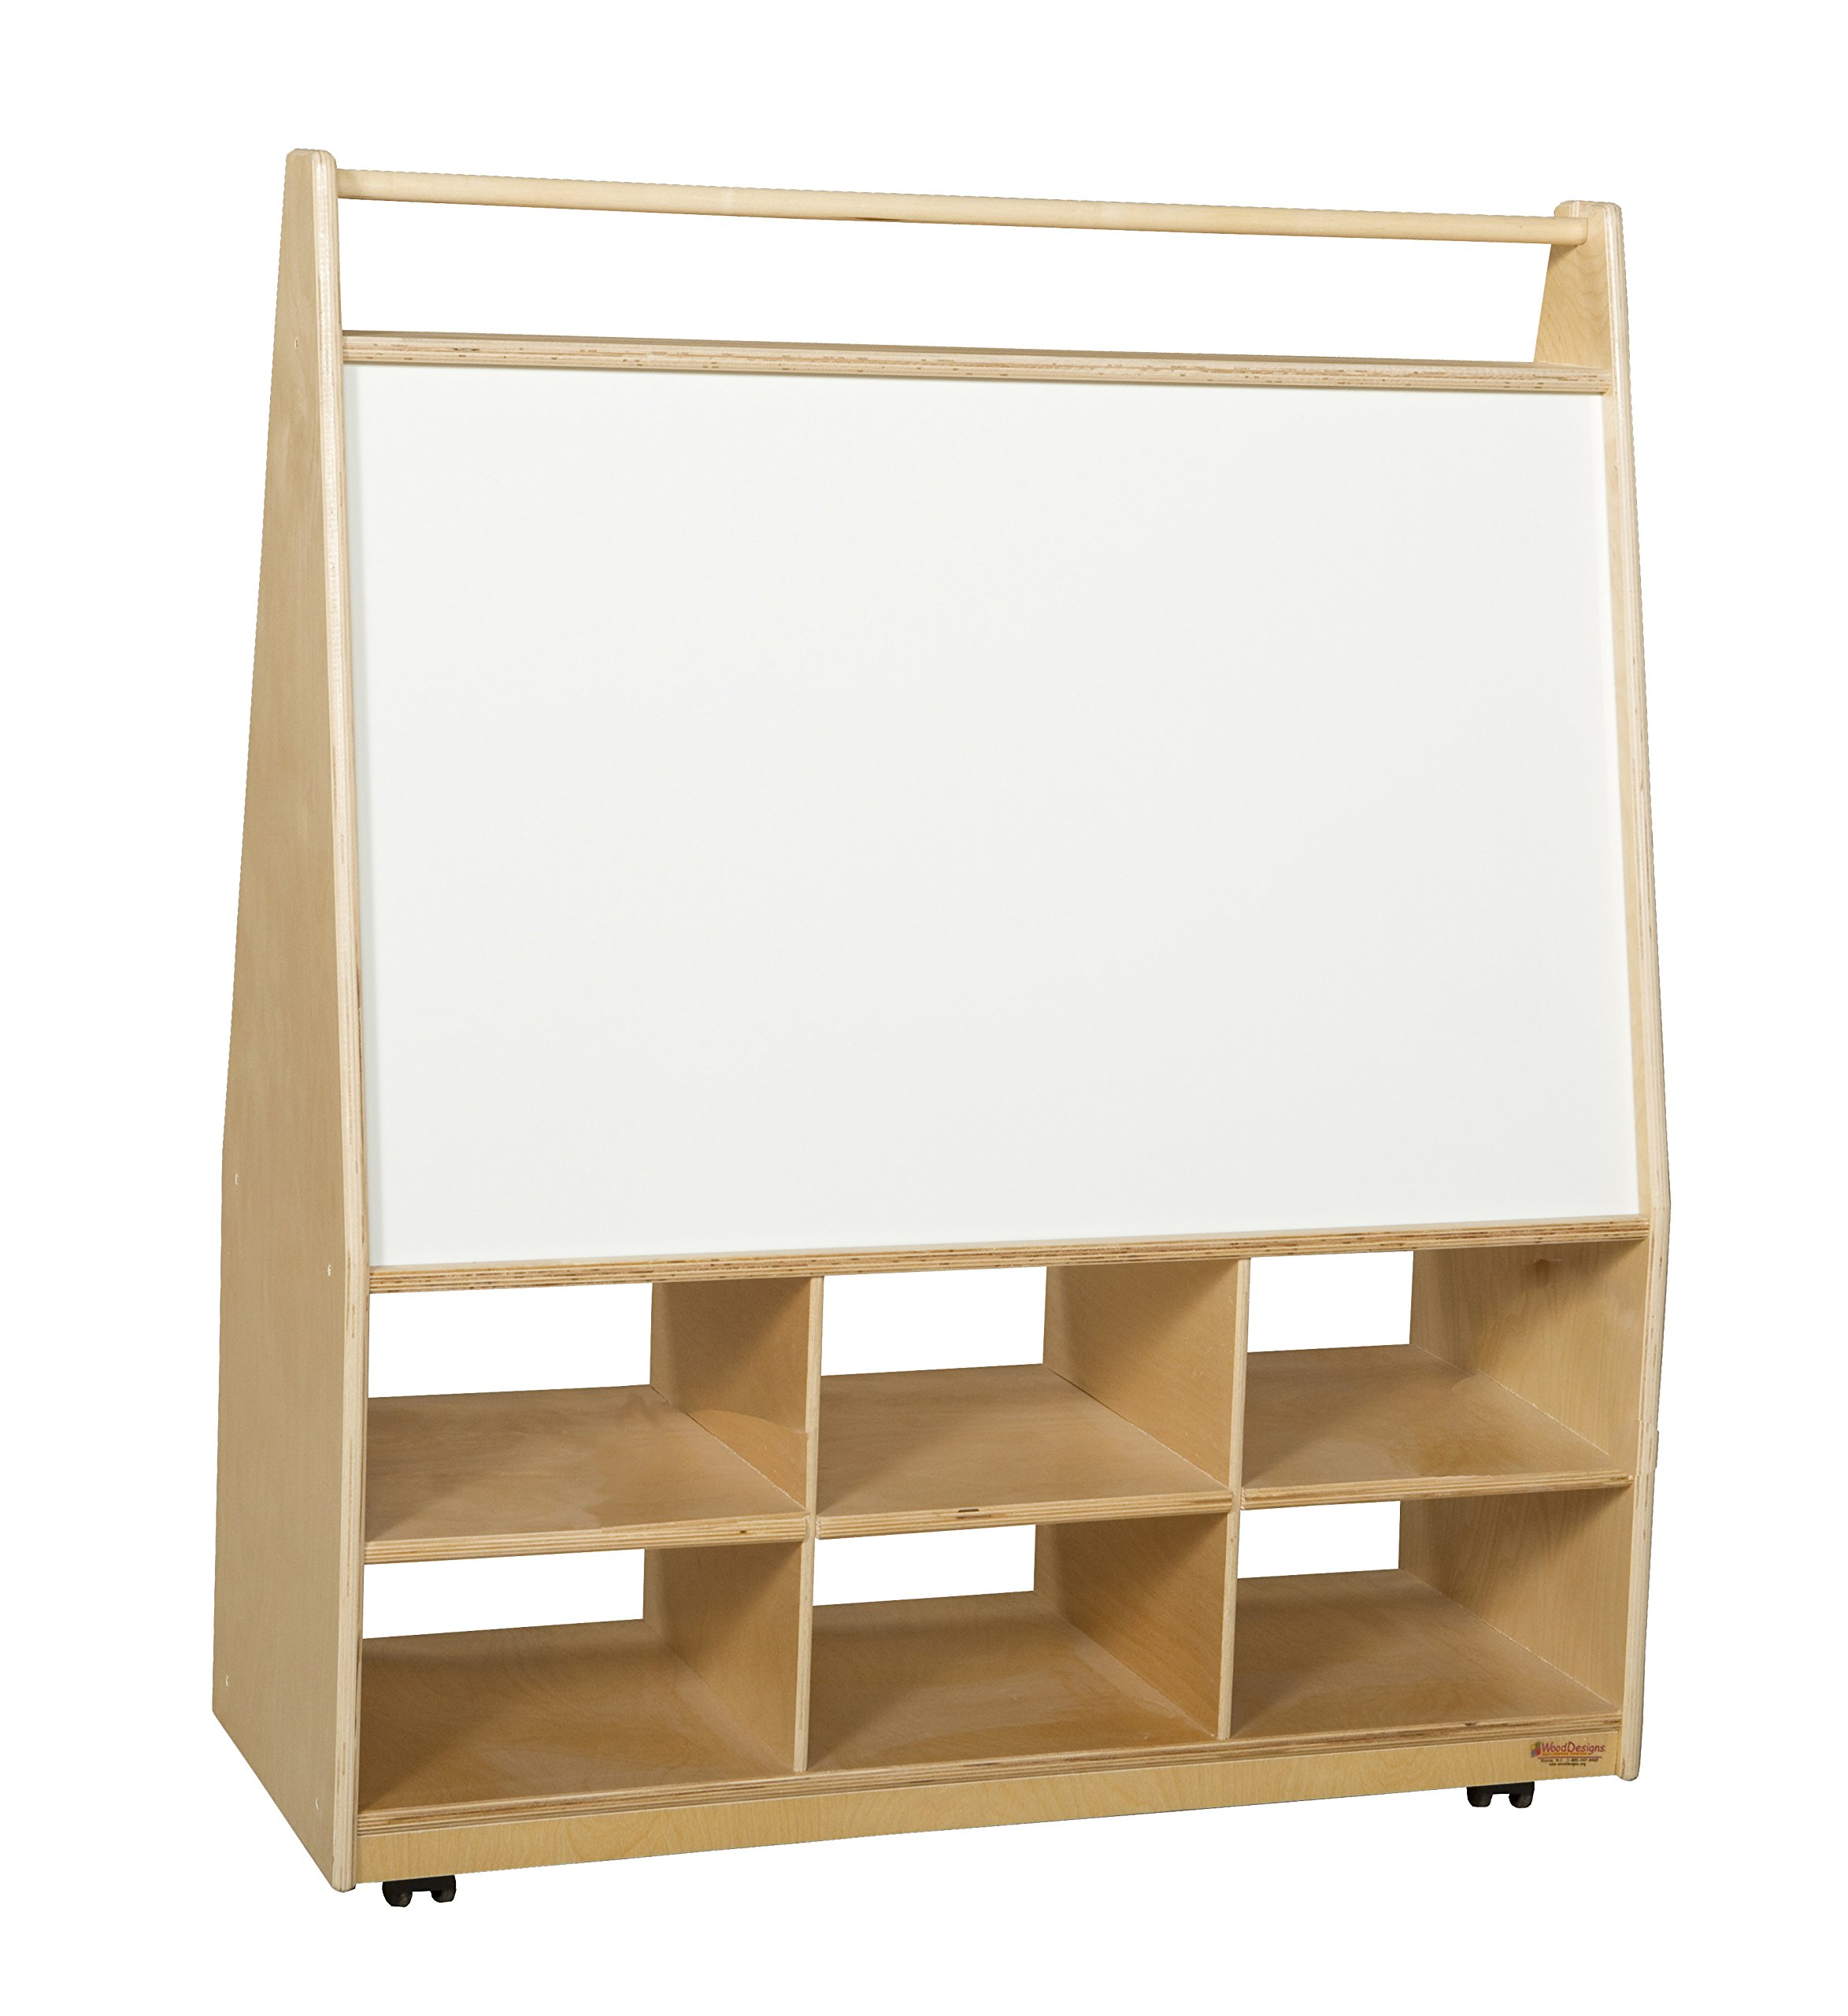 Wood Designs 990321 Mobile LITERACY Display, 44'' Height, 36'' Width, 15'' Length